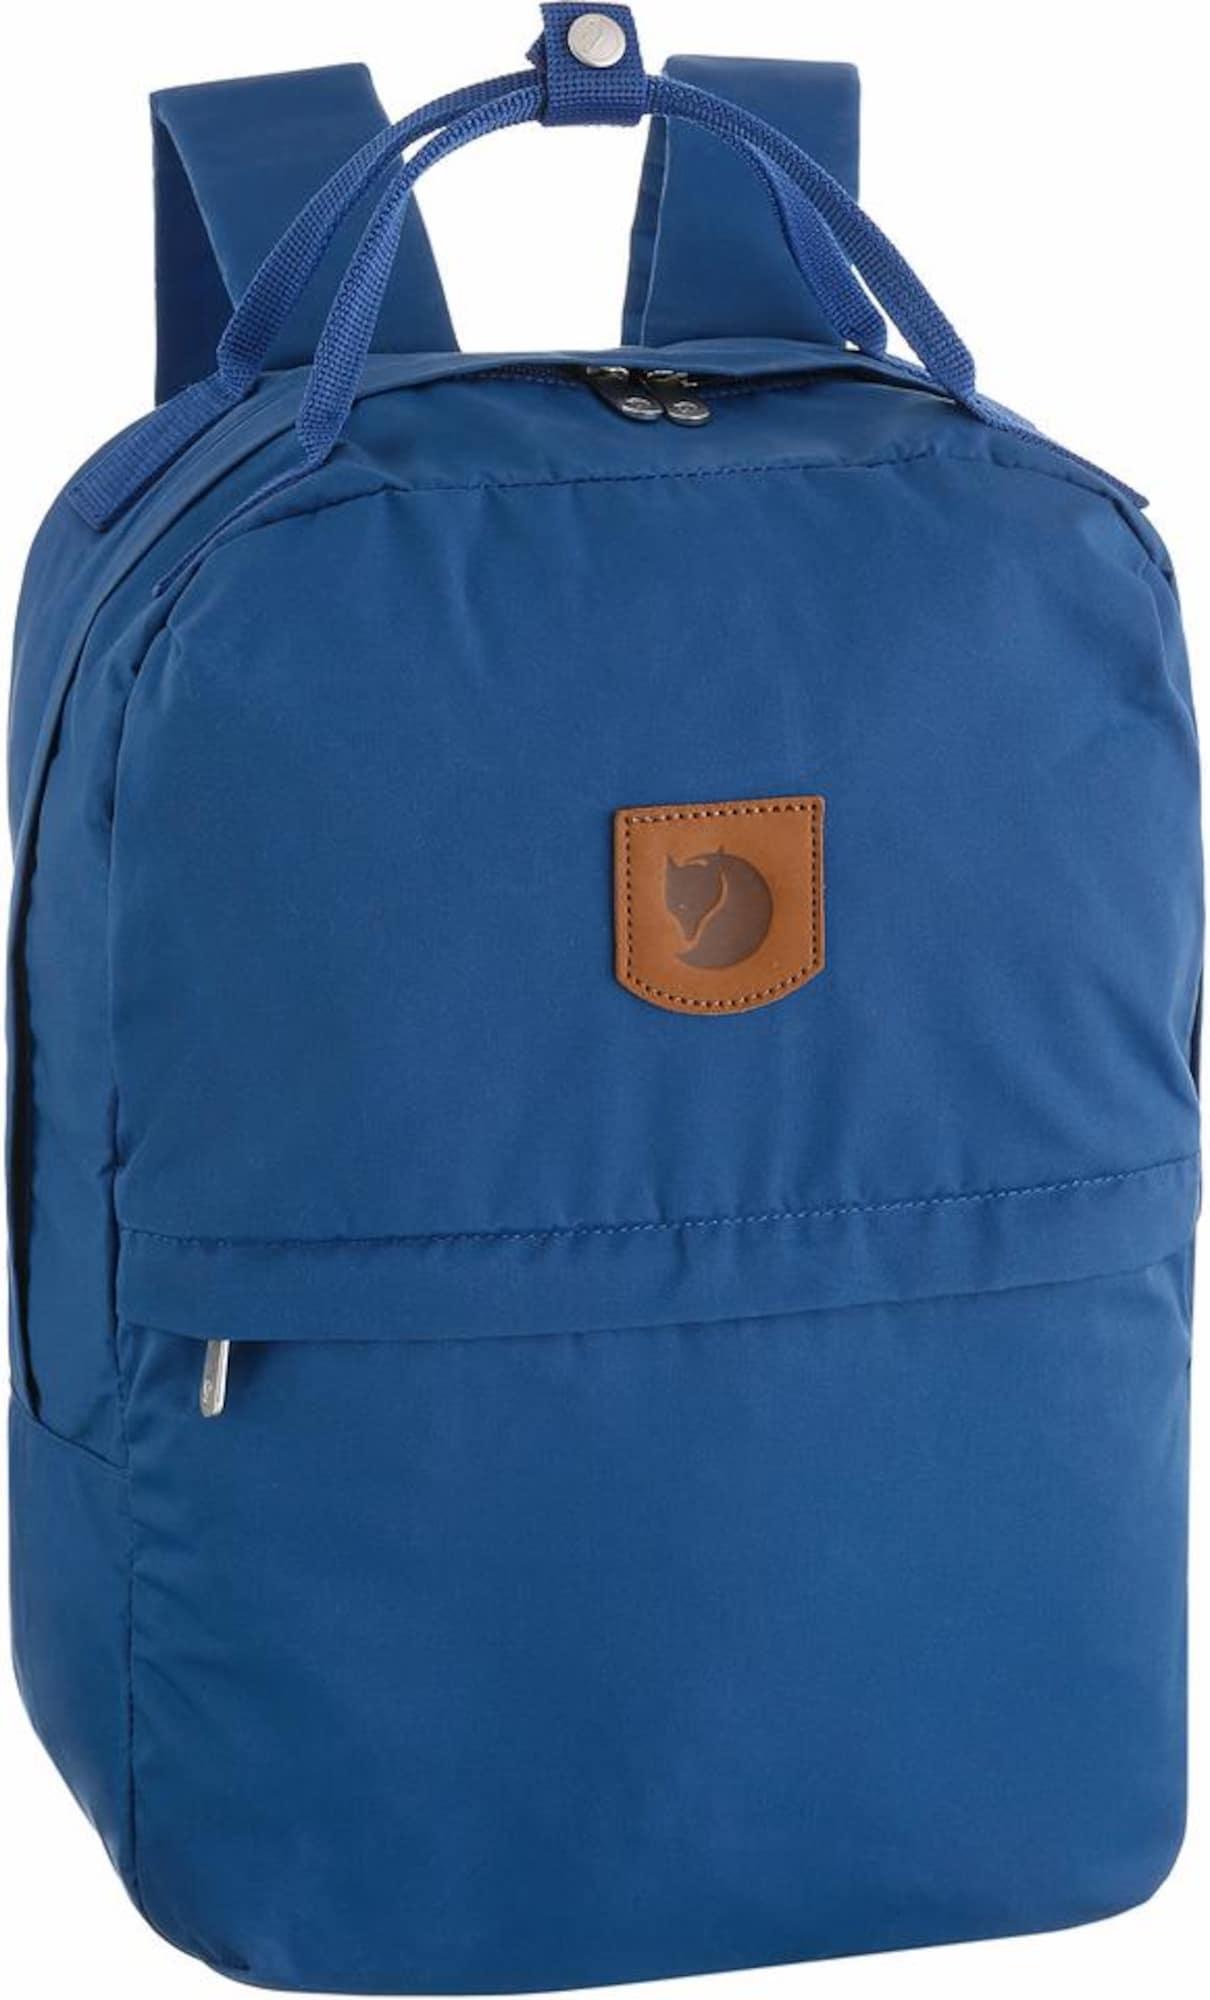 Rucksack 'Greenland Zip Large' | Taschen > Rucksäcke > Sonstige Rucksäcke | Fjällräven